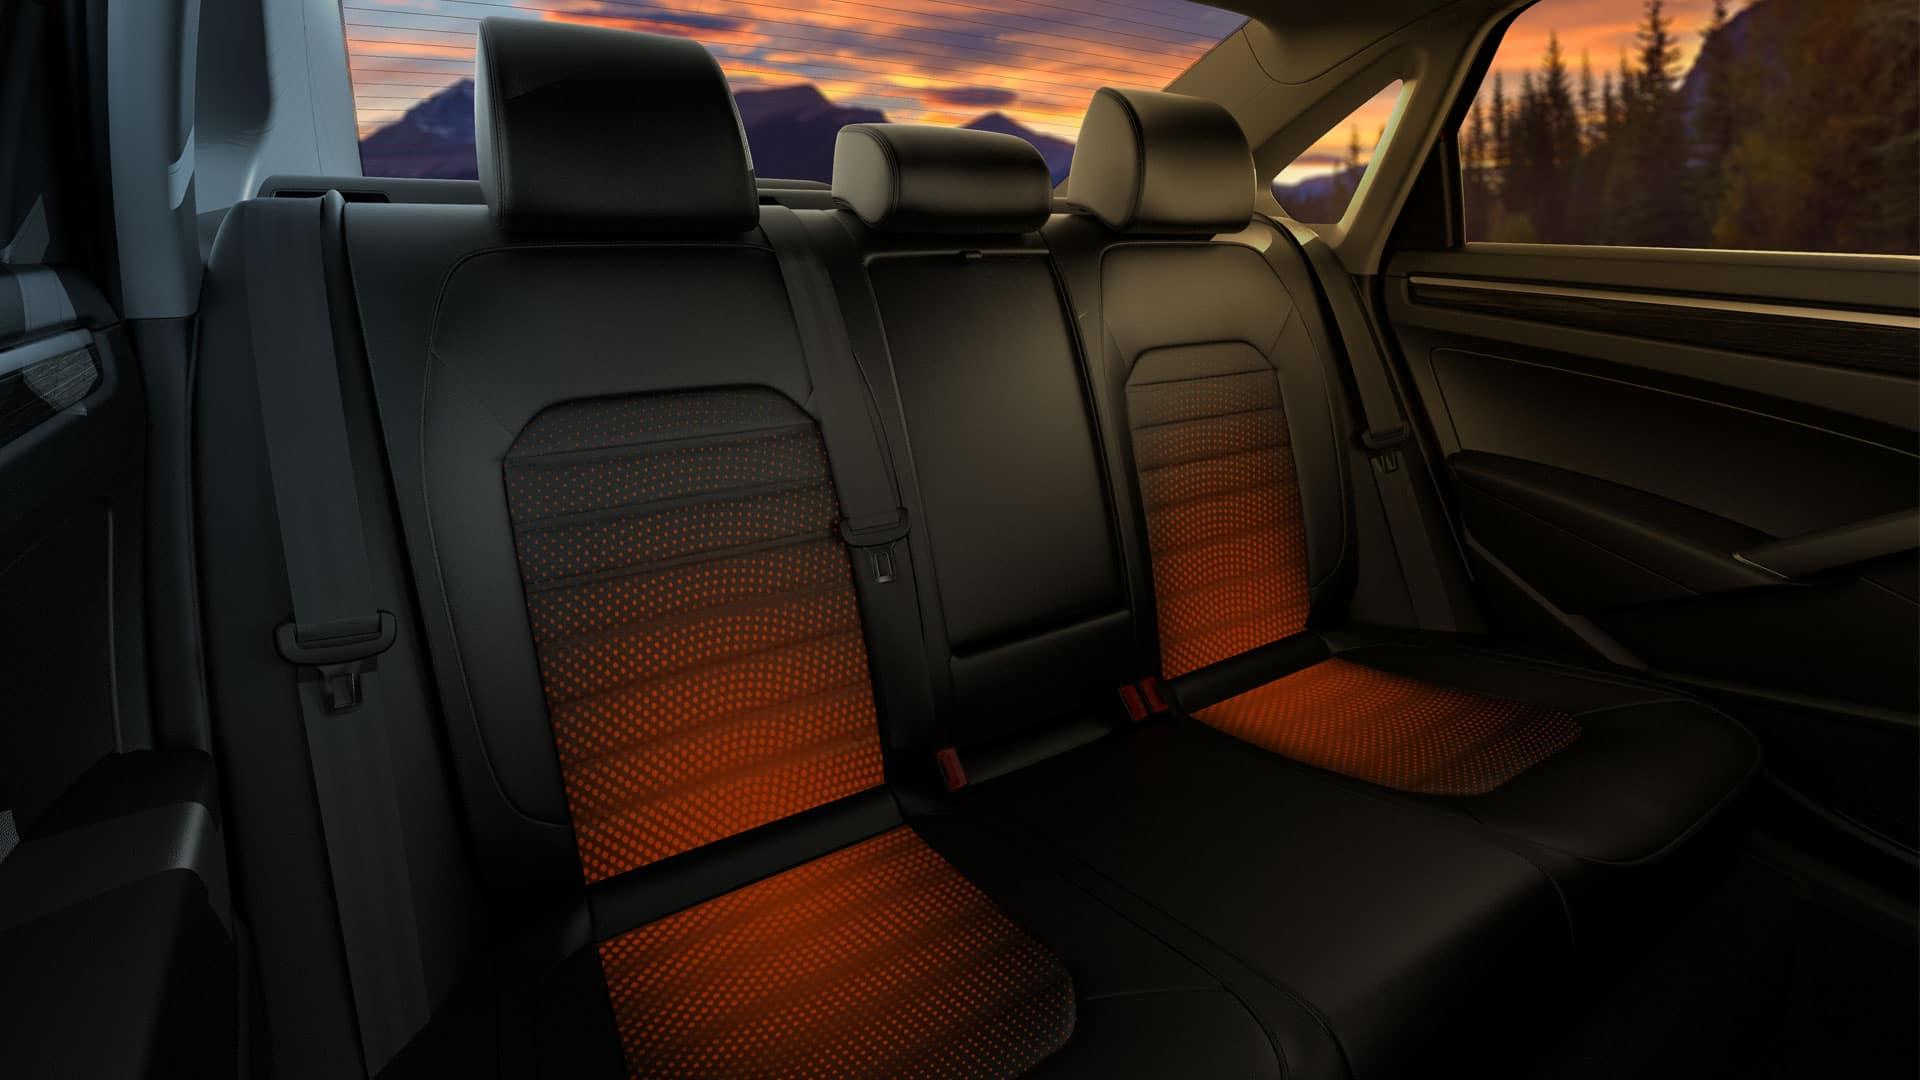 Illustration of heated seats